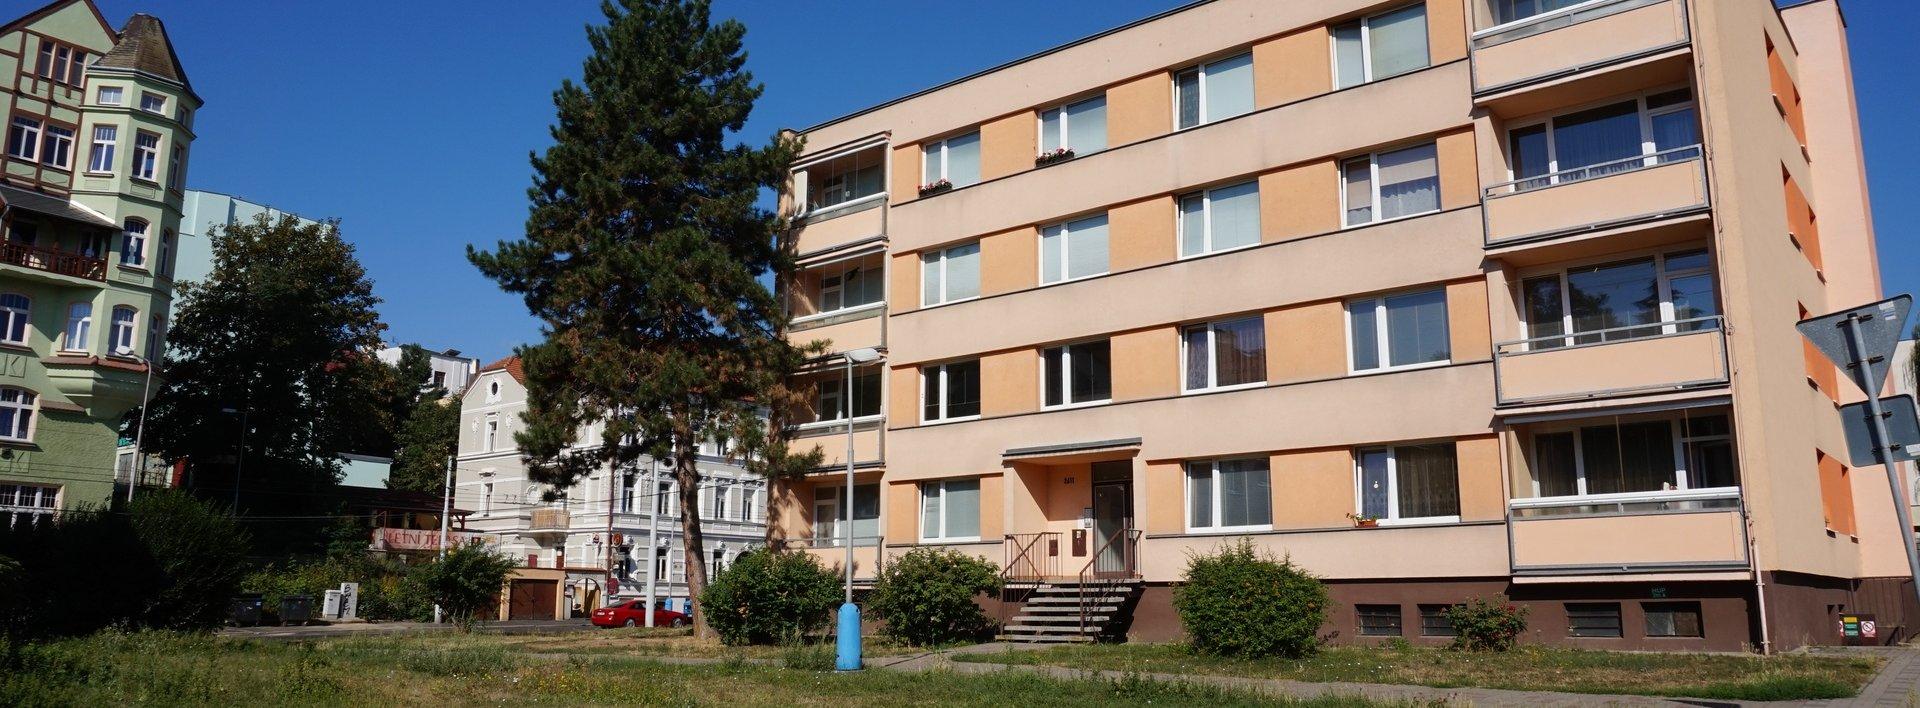 Prodej, Byty 3+1+L, 64 m2, v O.V. Jankovcova ul., Teplice., Ev.č.: N48547